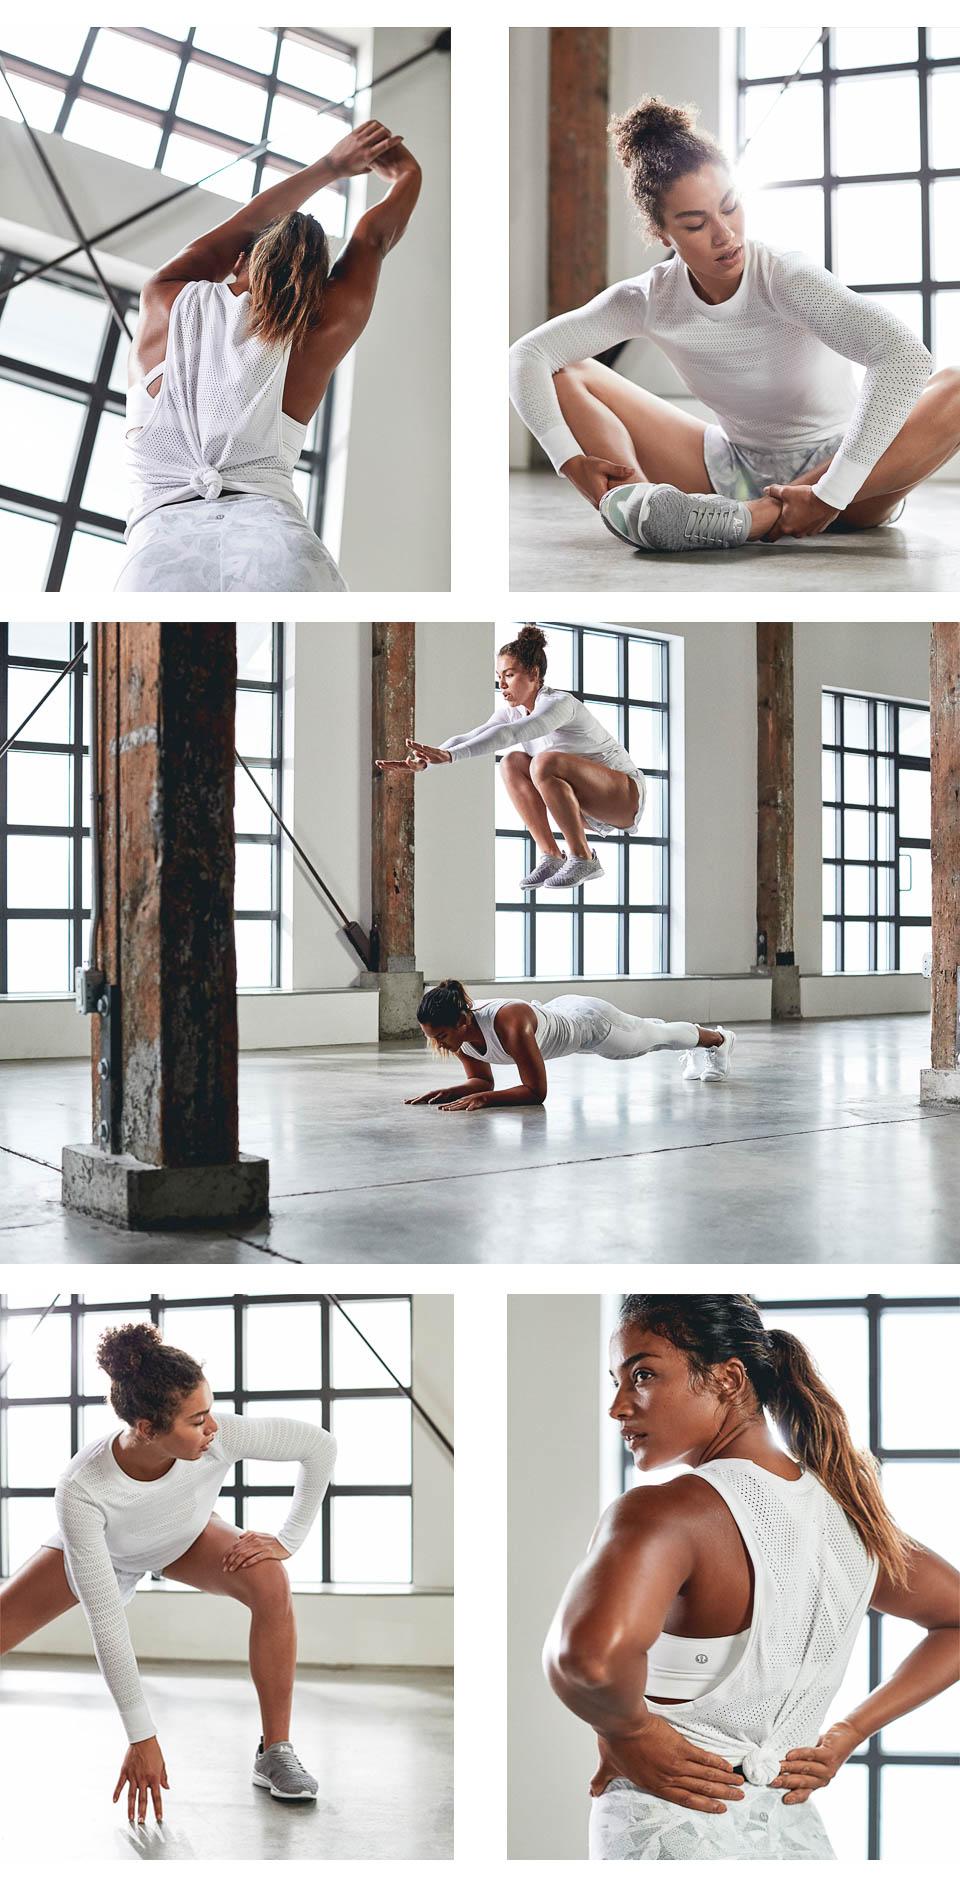 Mahina-Garcia-Catrina-Judge-Training-Workout-Vancouver-Canada-photoshoot-lululemon-athletica-Matt-Korinek-Photographer-960px-2.jpg